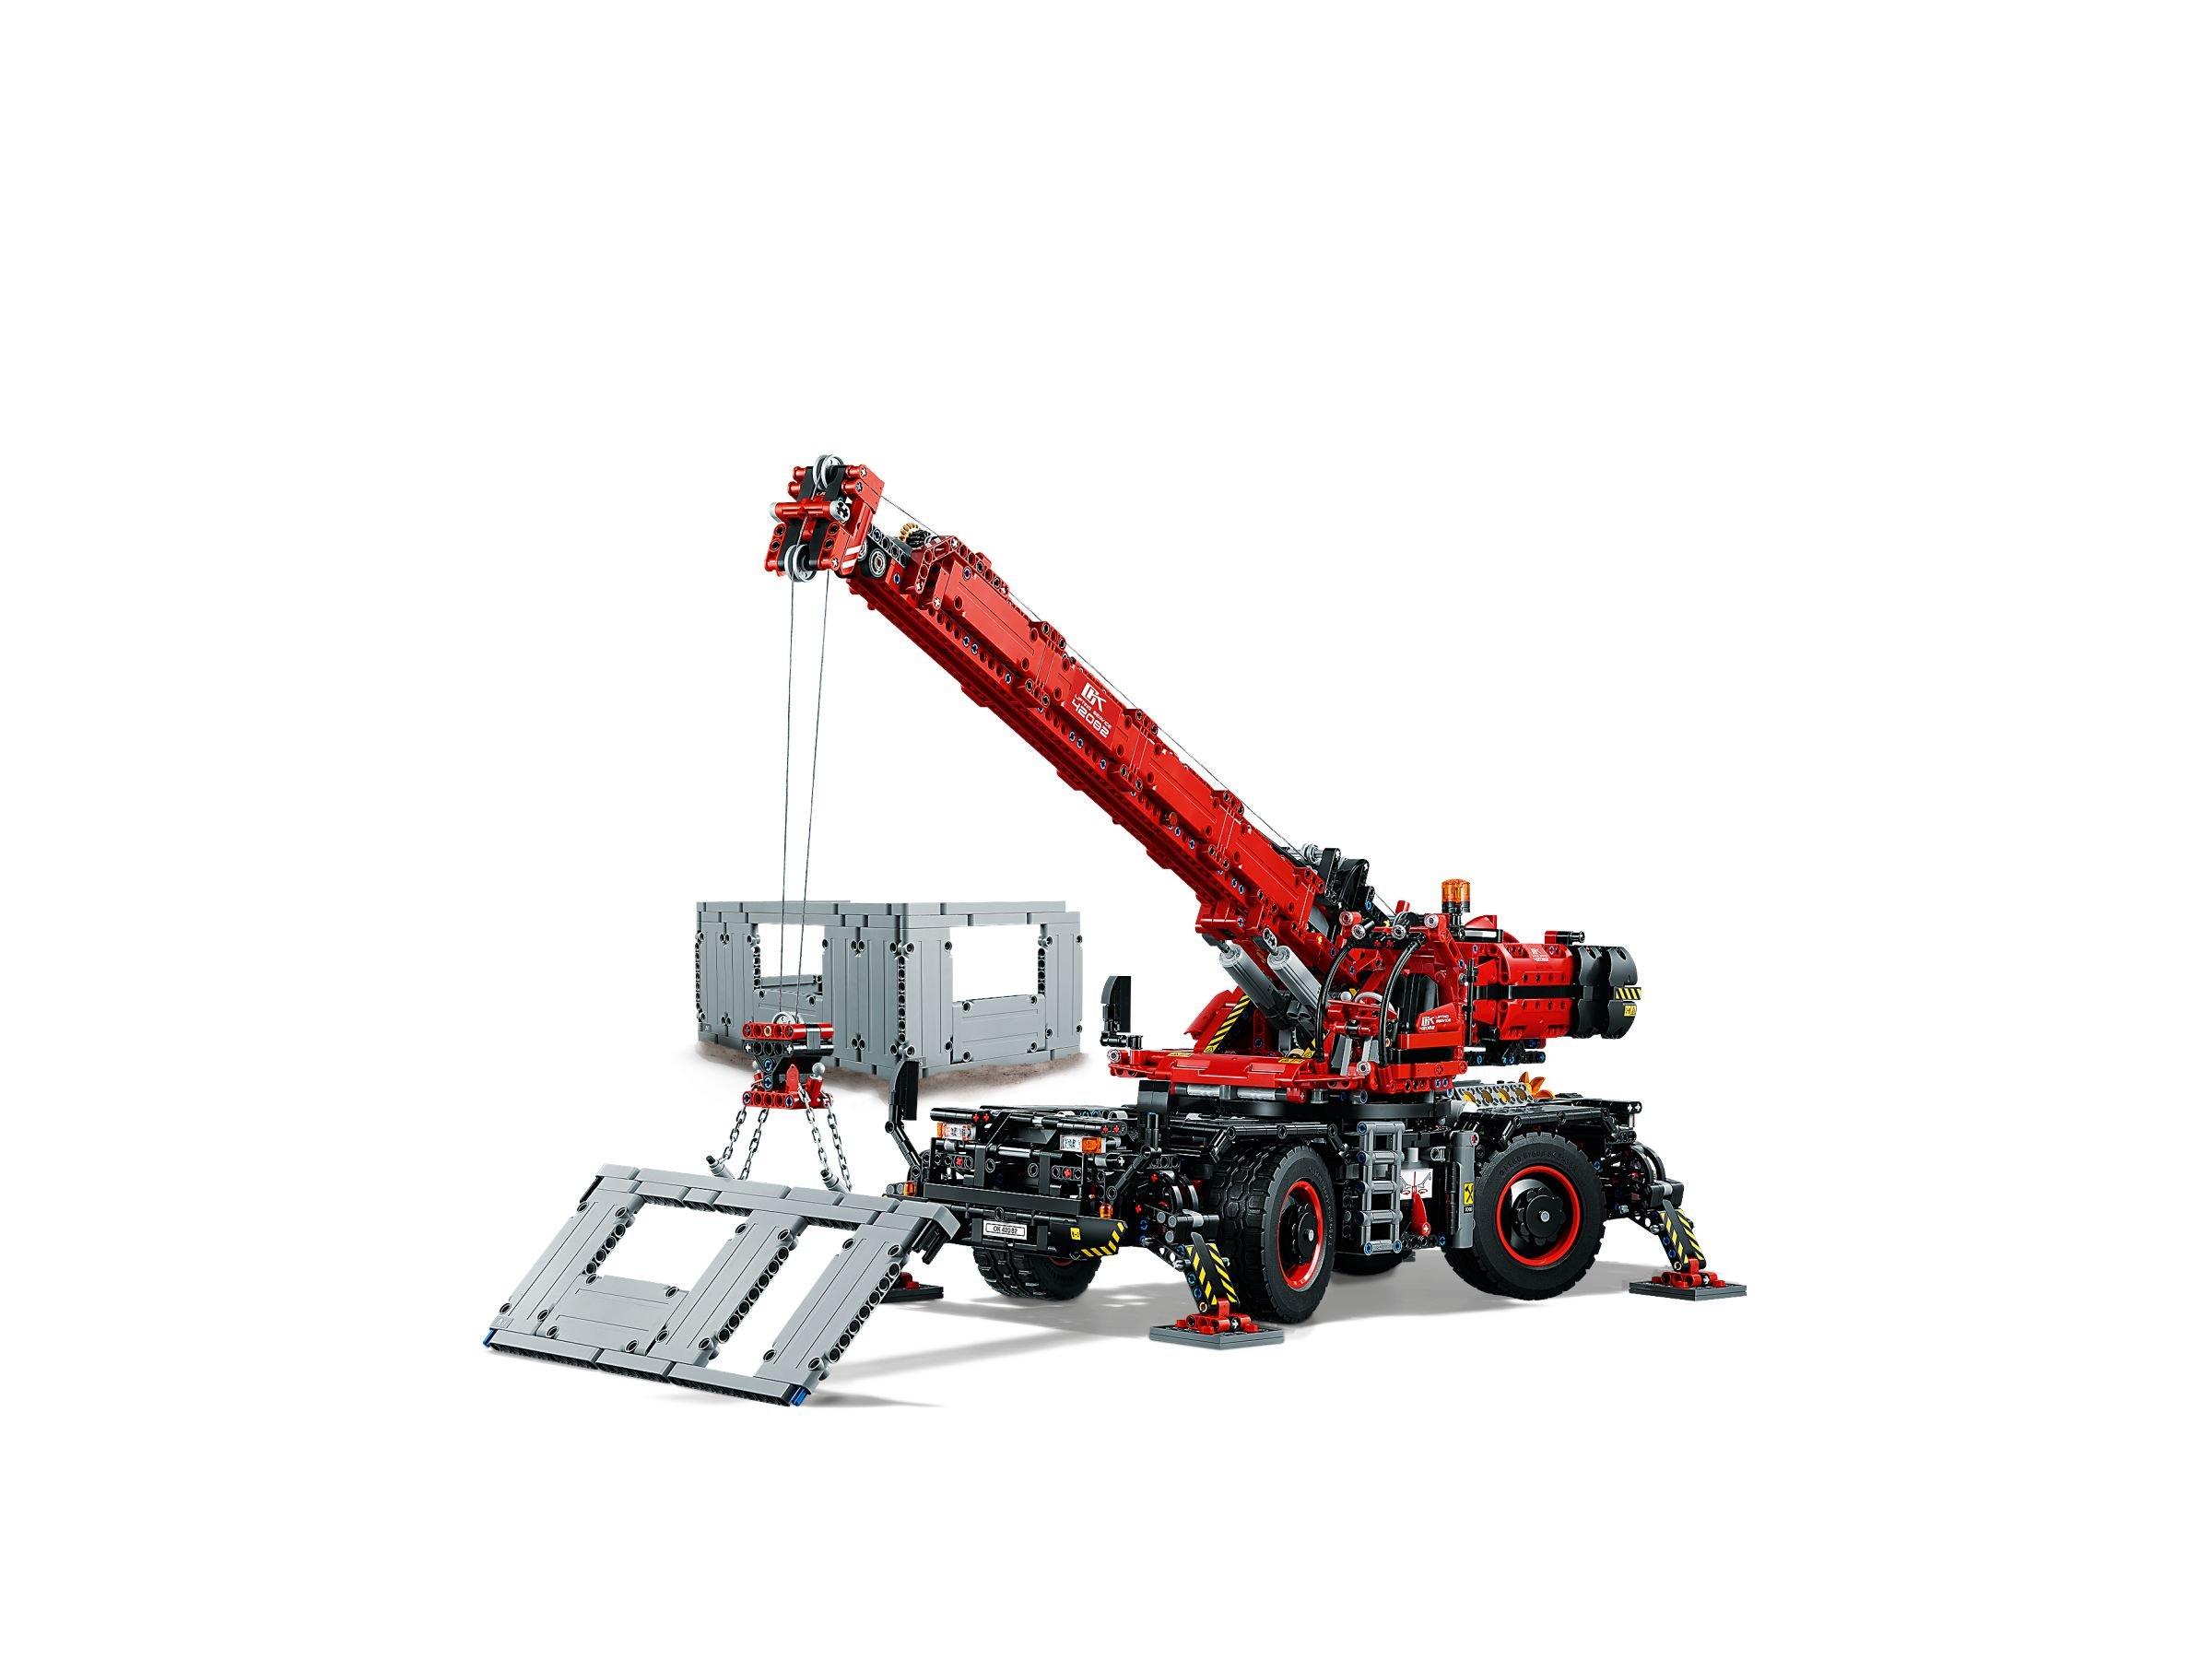 lego 42082 gel ndeg ngiger kranwagen technic 2018 ab 160 19 30 gespart rough terrain. Black Bedroom Furniture Sets. Home Design Ideas